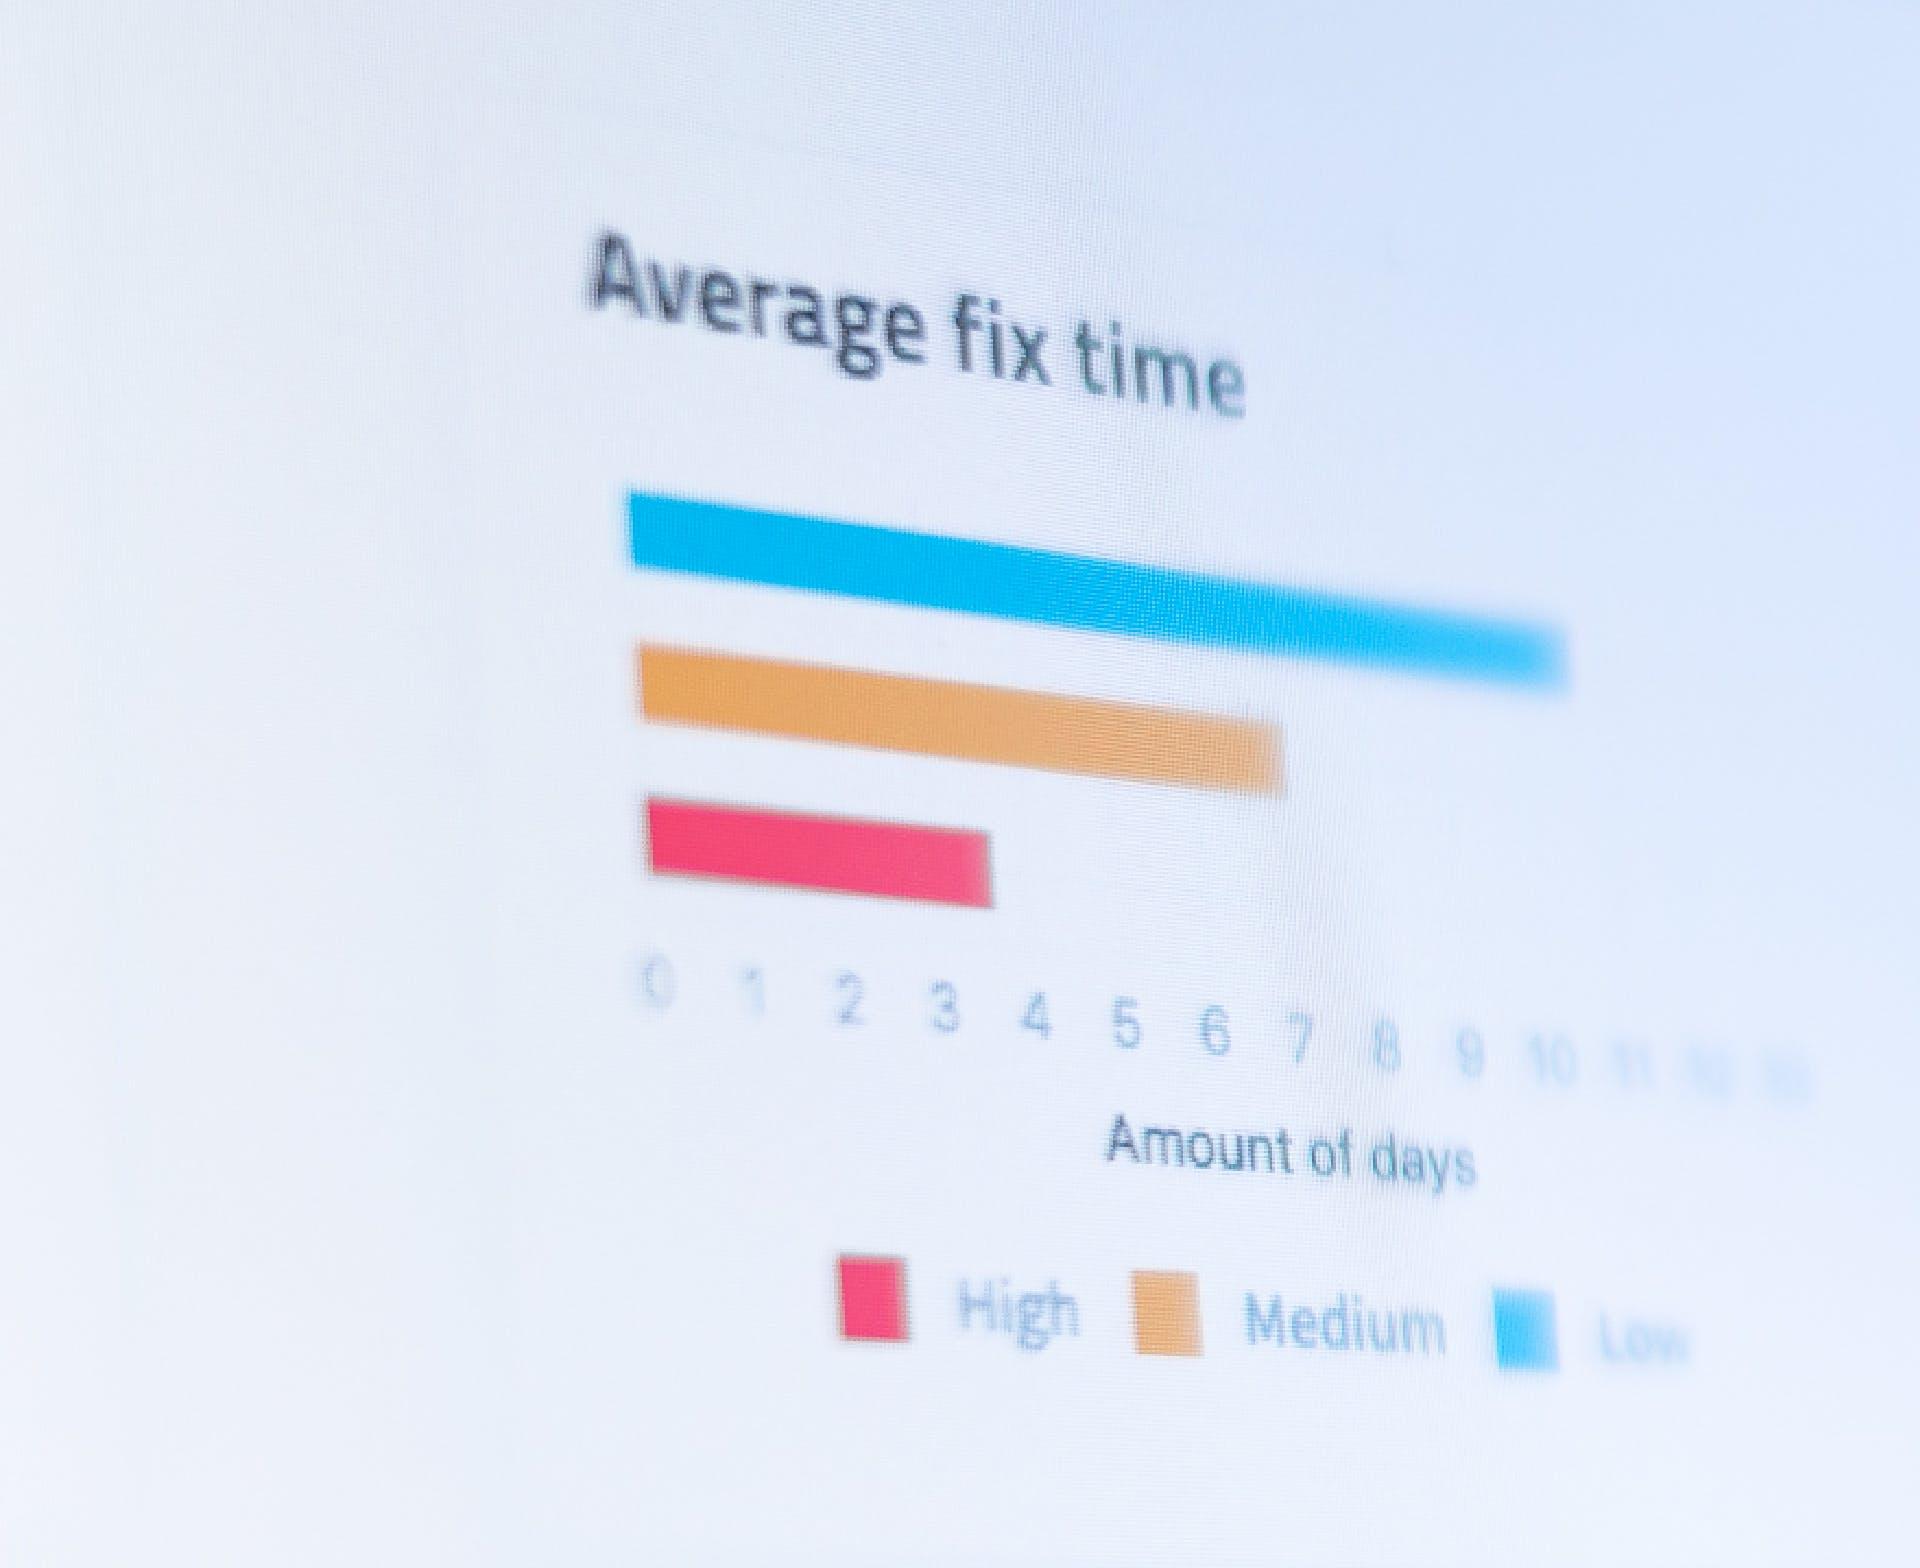 Average fix time graph